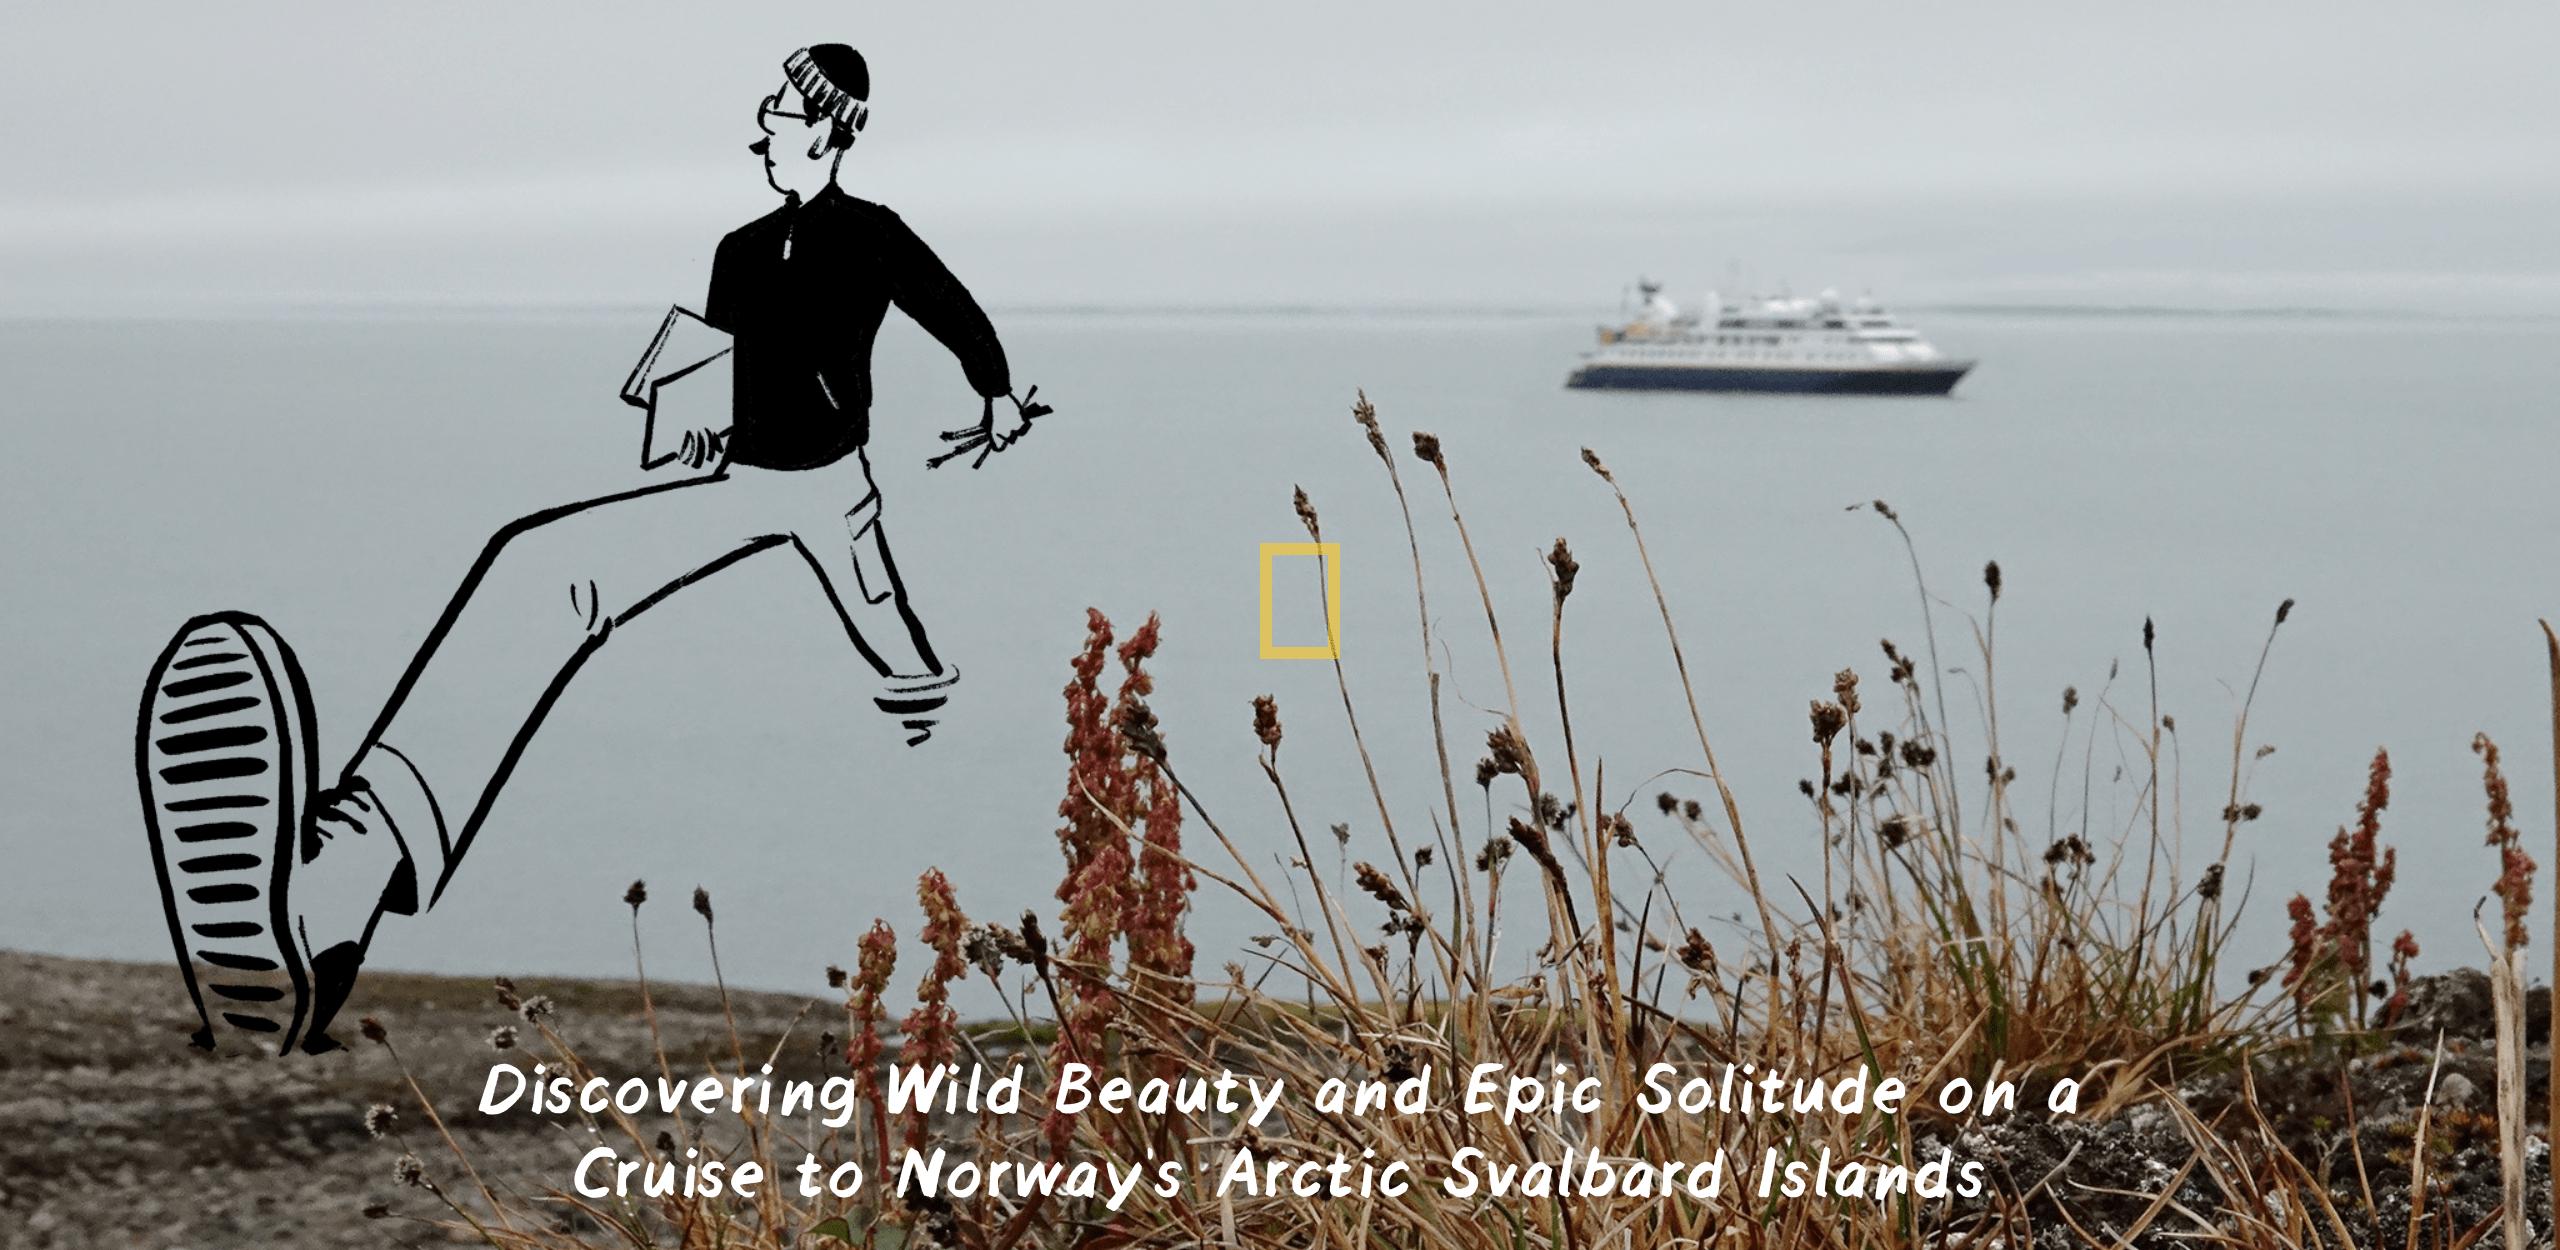 Christoph Niemann at Arctic